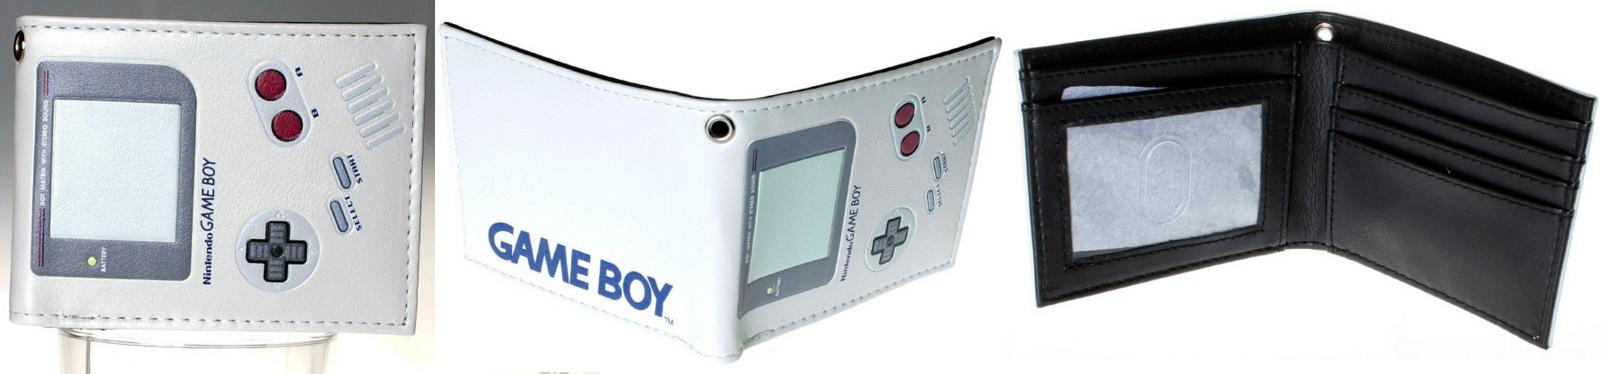 Cartera Game Boy